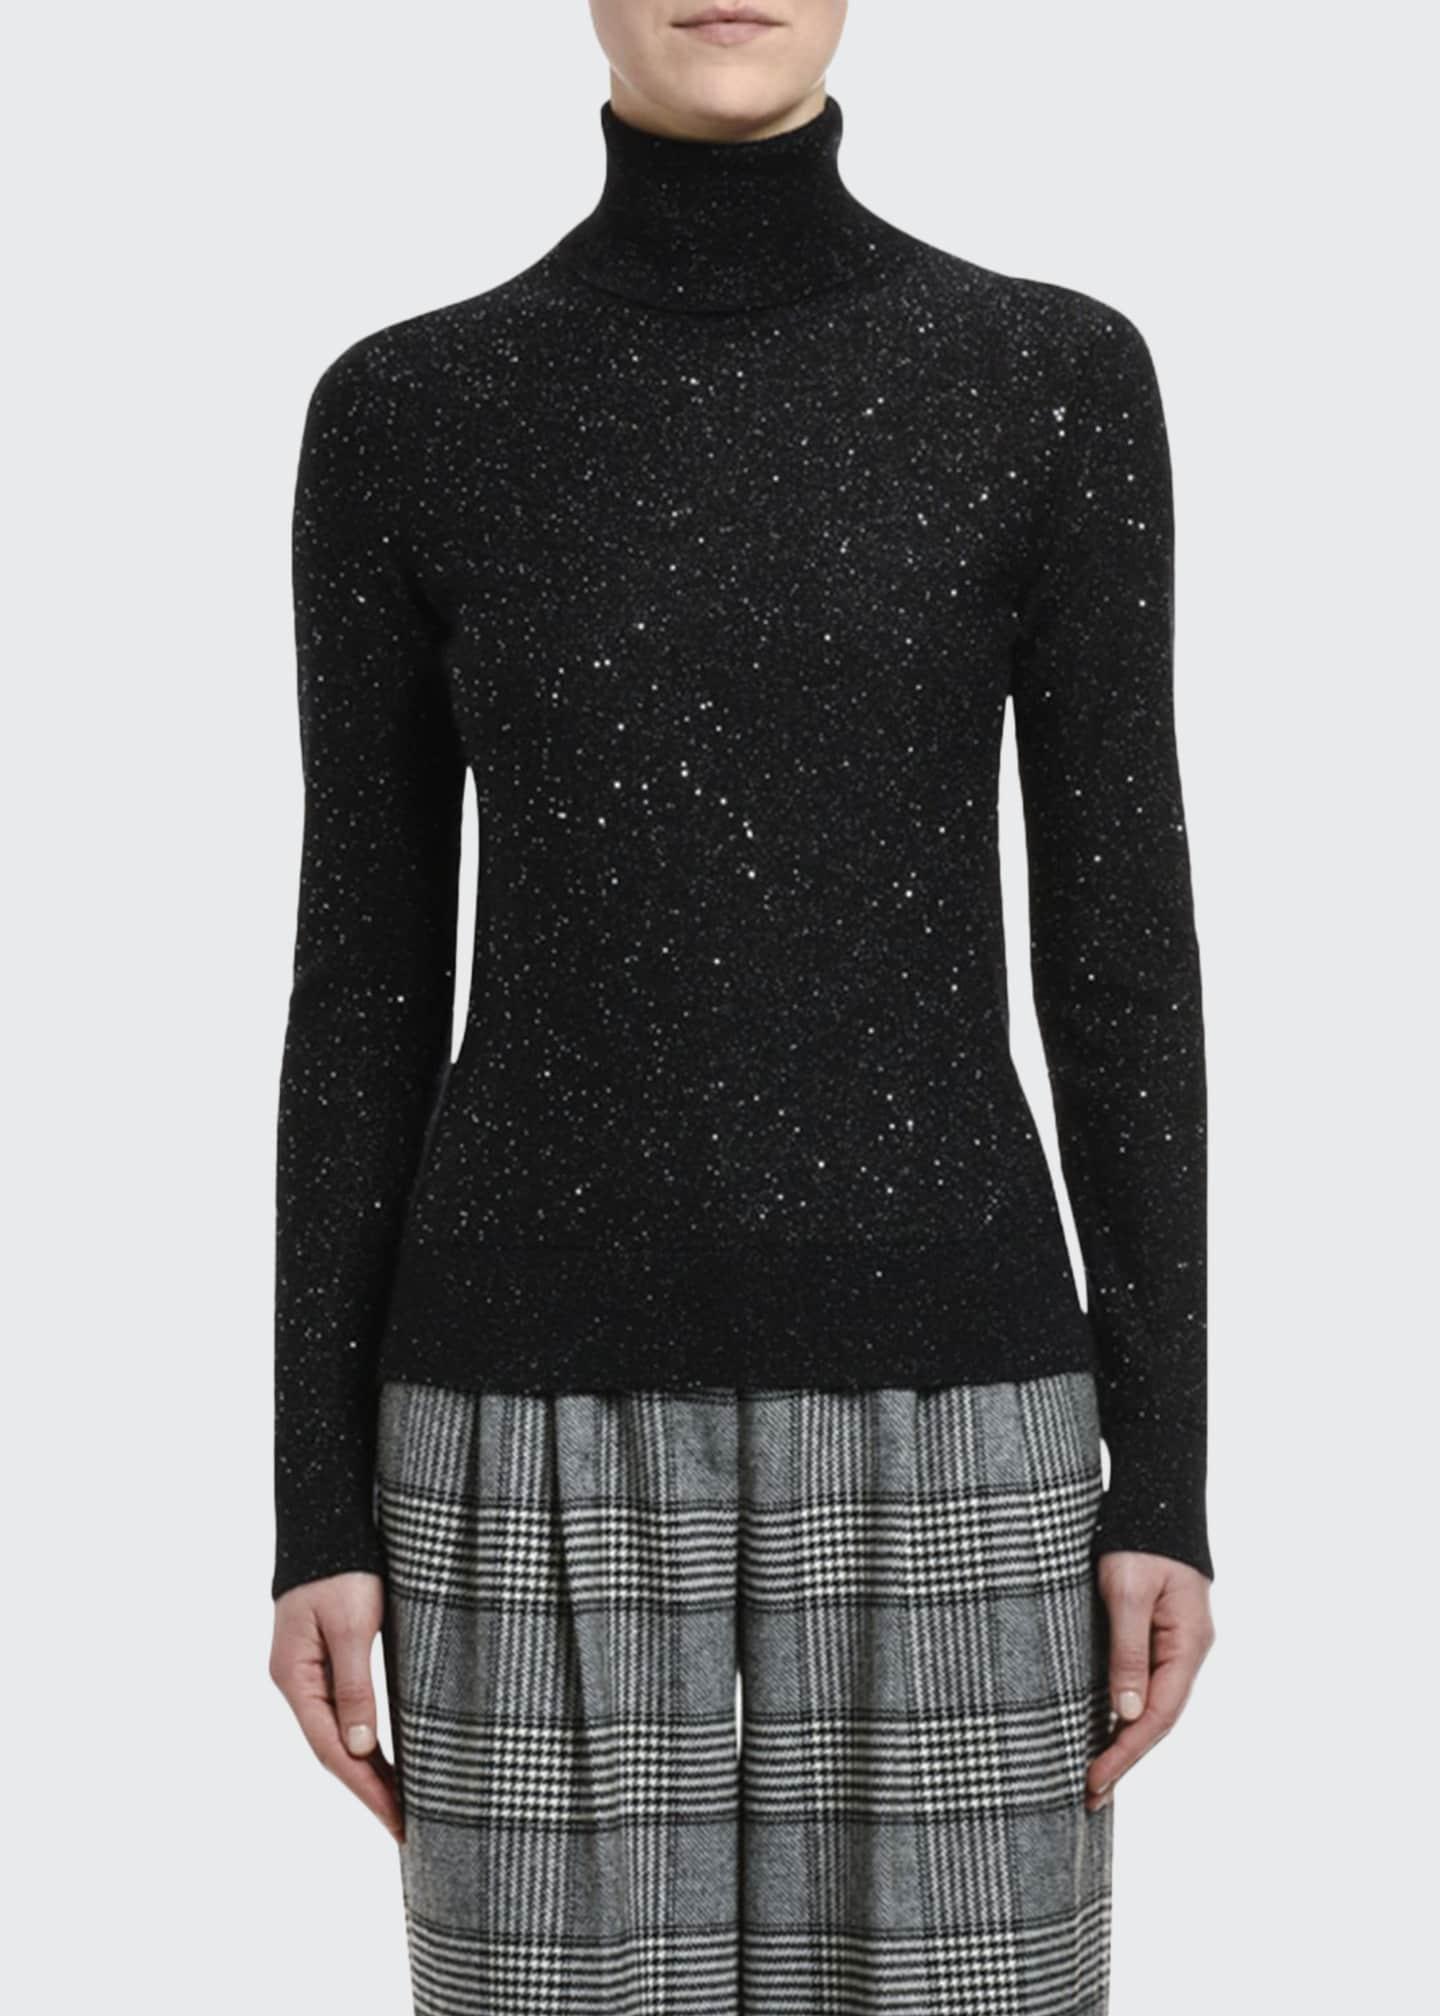 Dolce & Gabbana Mohair-Silk Turtleneck Sweater